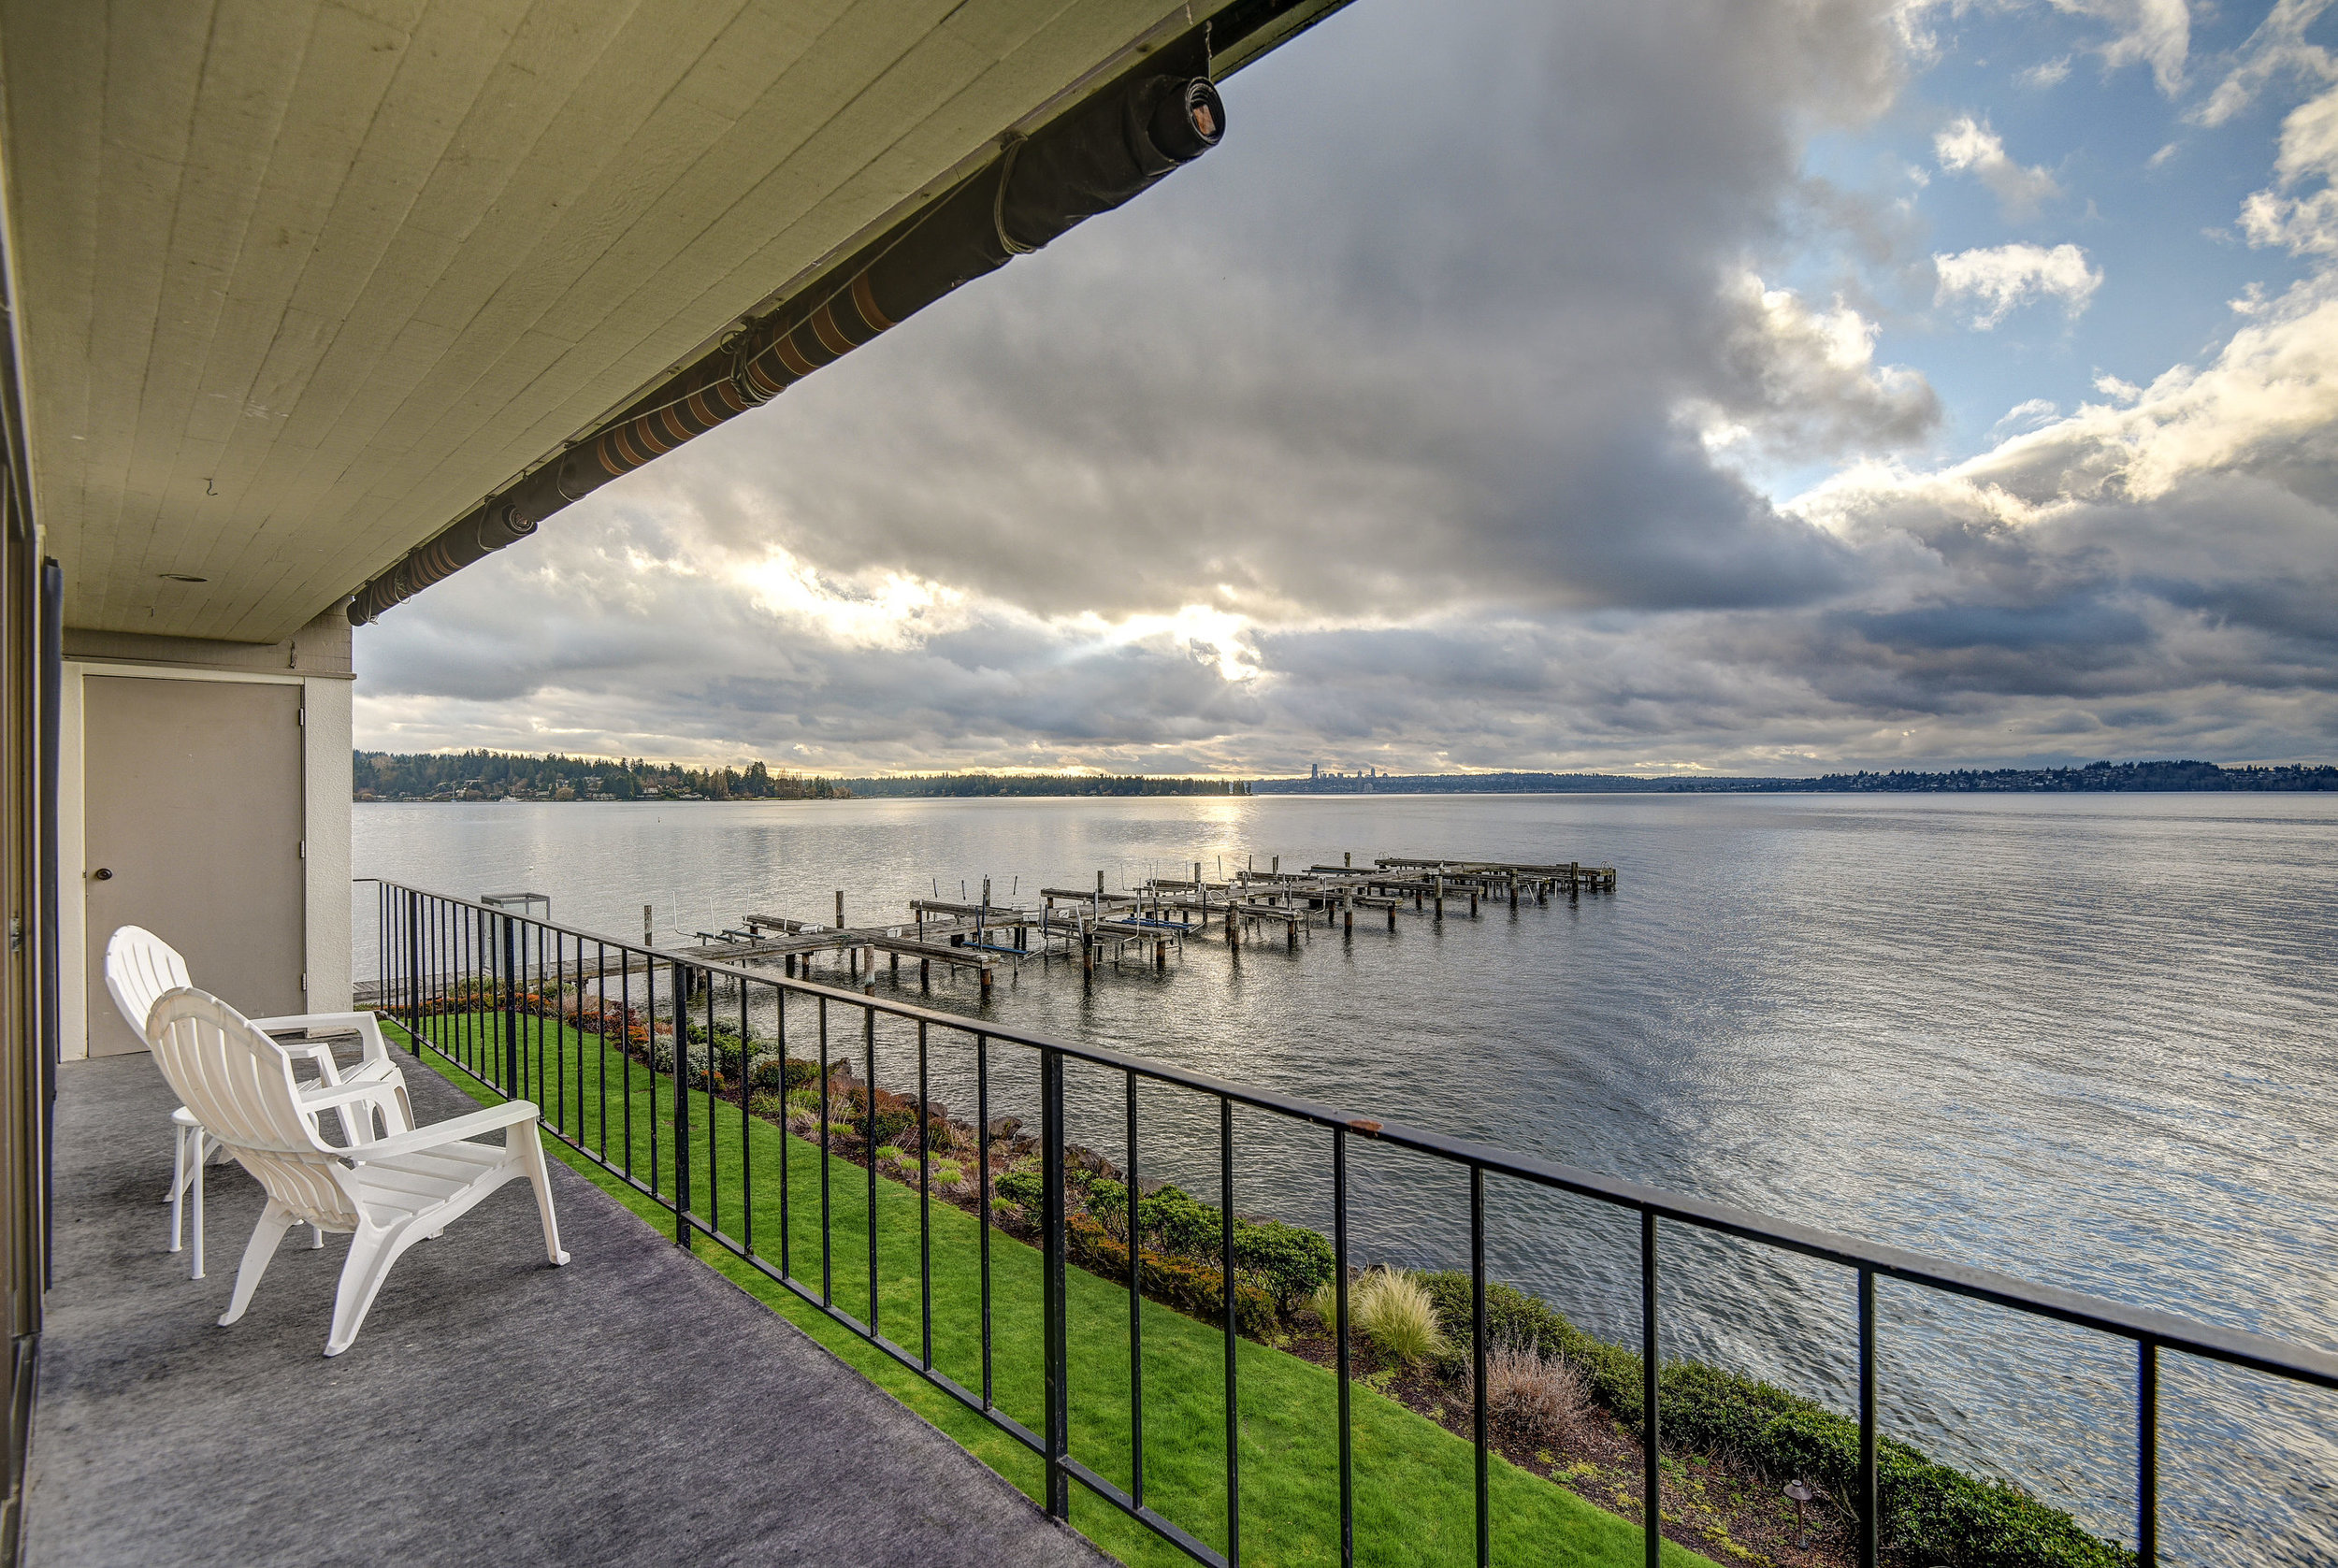 6401 Lake Washington Blvd NE-print-016-17-DENNON 6401AndyK 16-2700x1811-300dpi.jpg